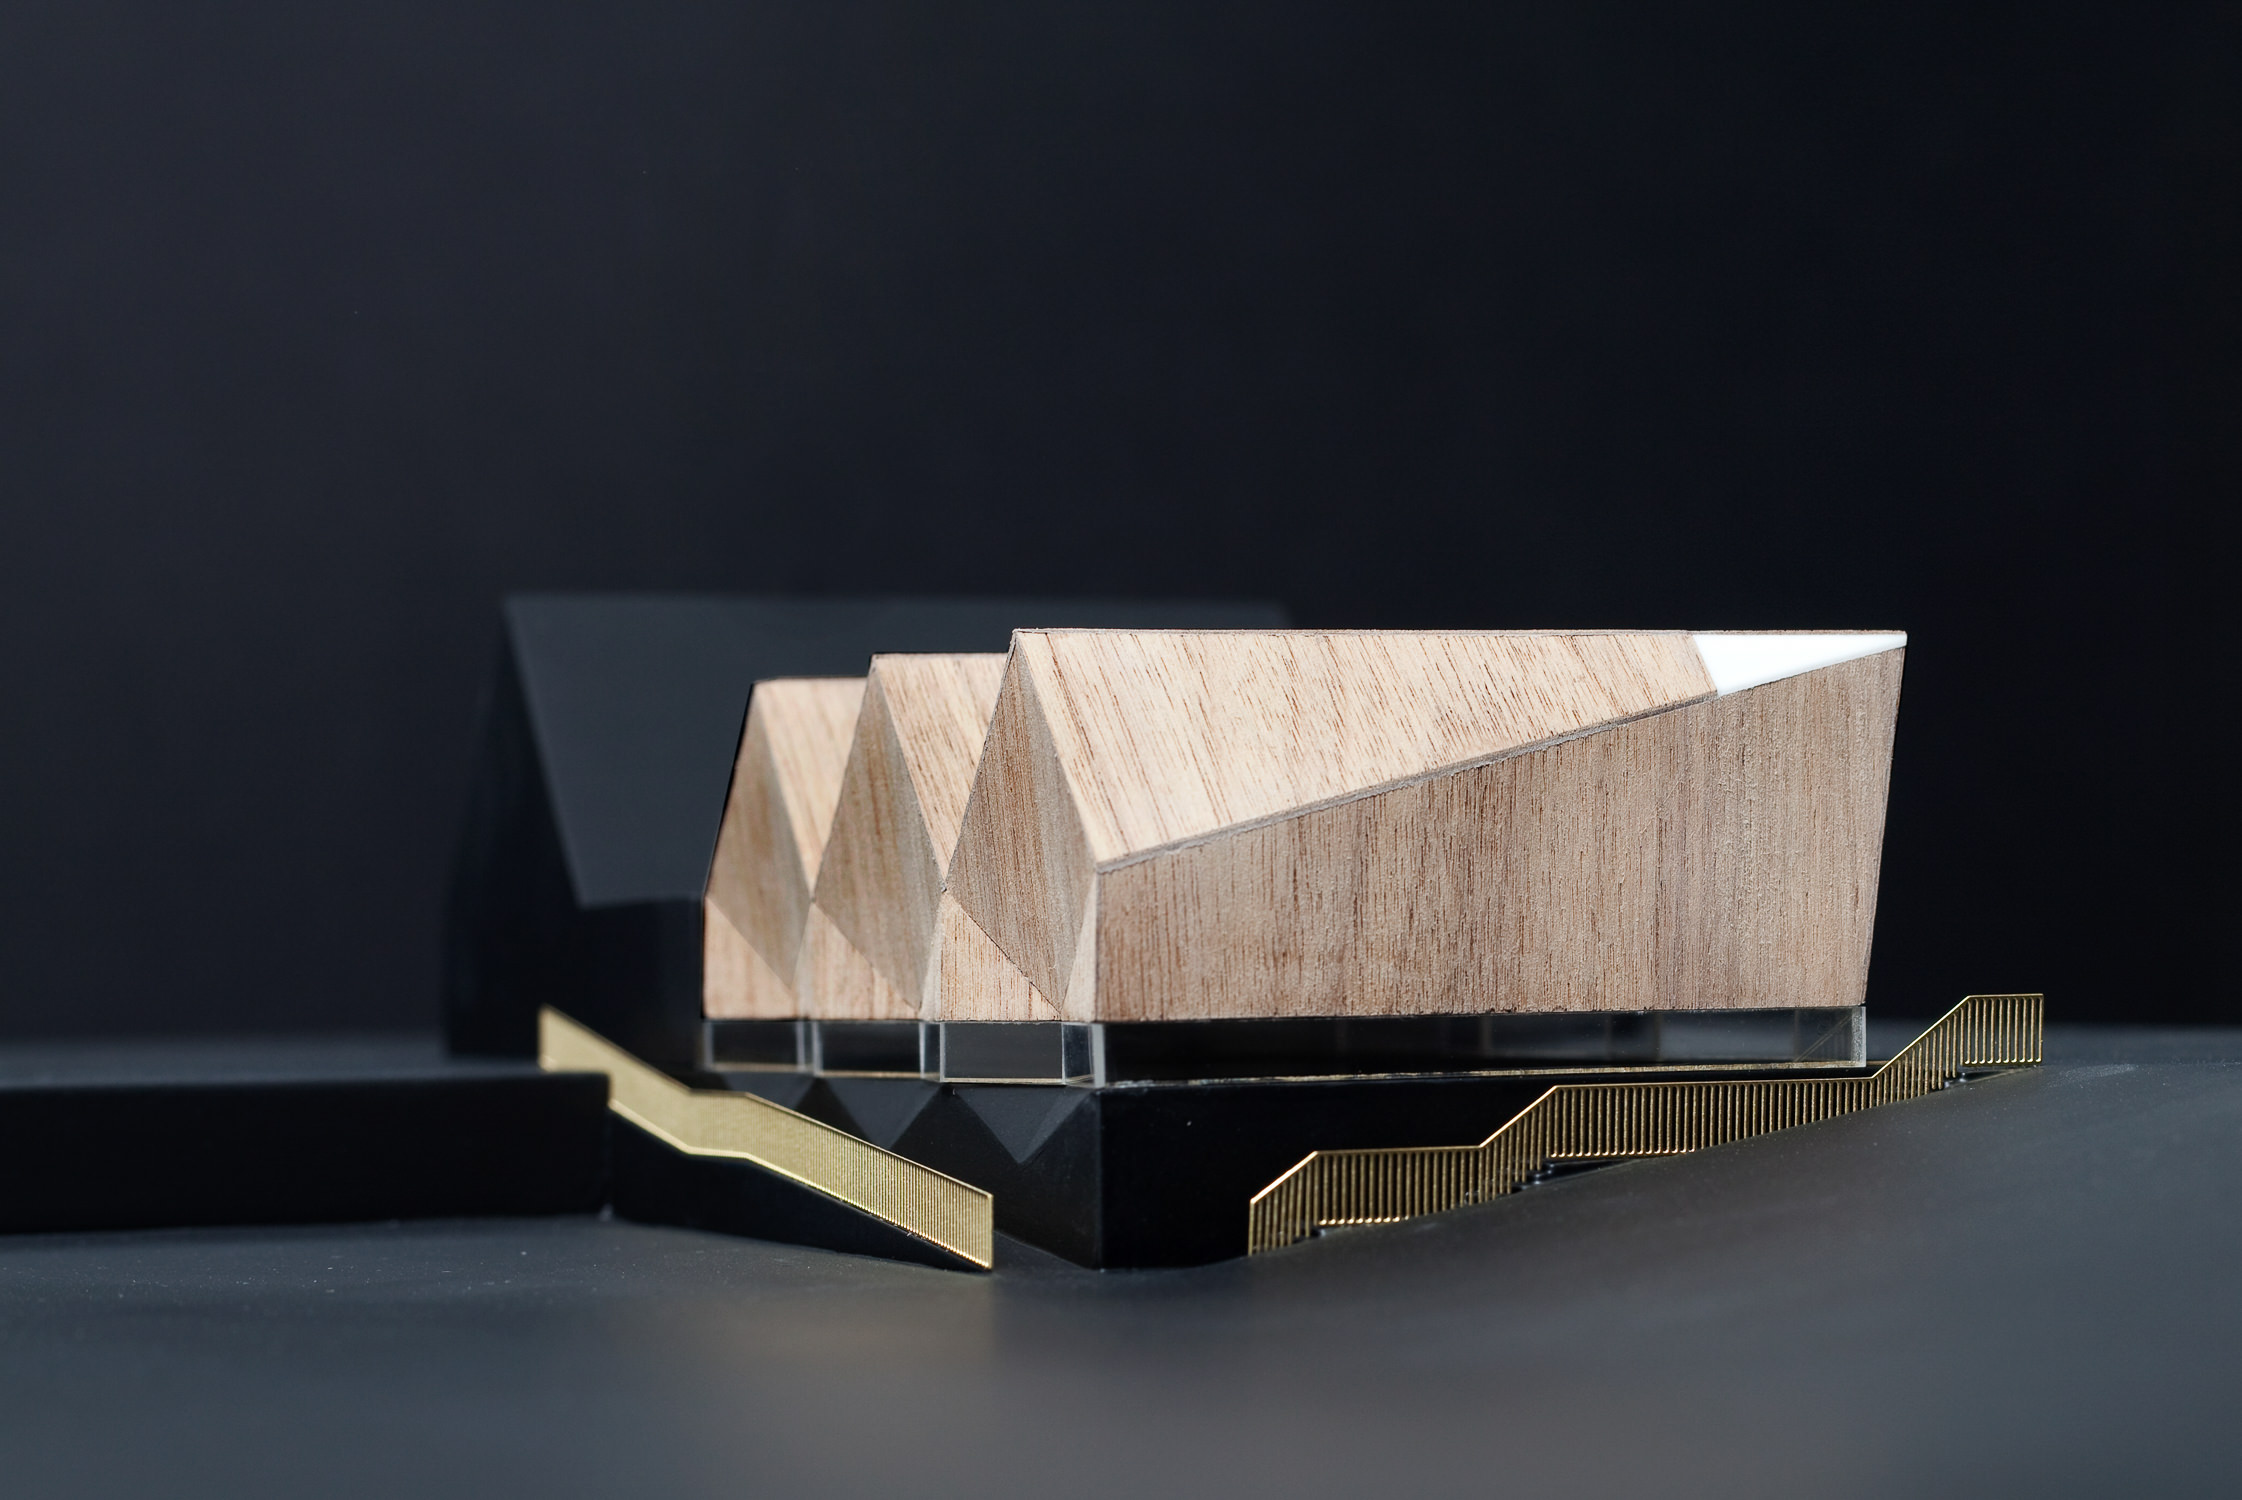 mark-hadden-architecture-photographer-architectuur-interieur-fotografie-london-dma-alfriston-model023-.jpg